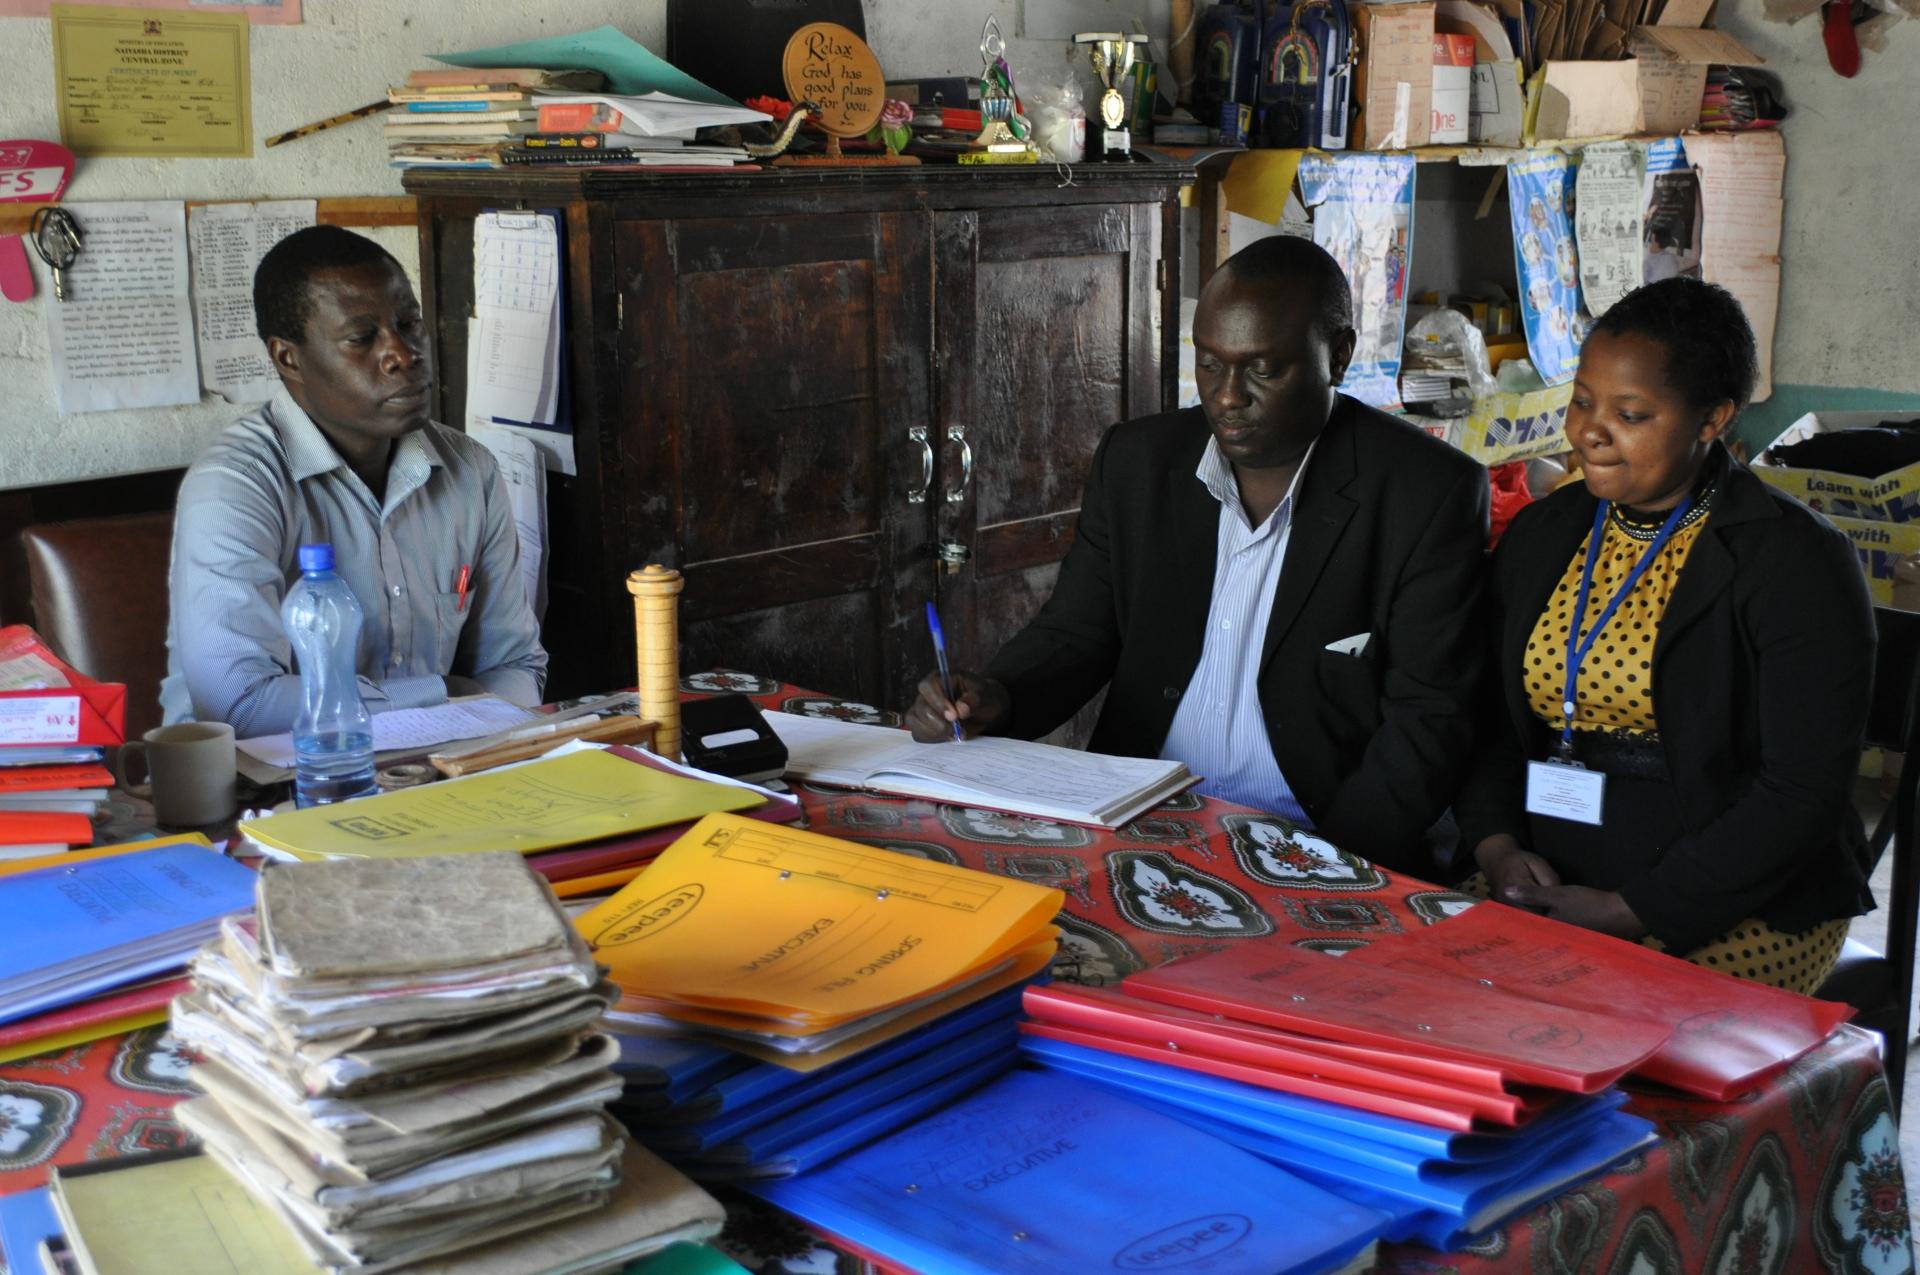 Deputy Head Teacher (left) with ASN Upendo Village Child Welfare Officer, Samuel Maina, and Assistant Child Welfare Officer,  Patricia Mwaura